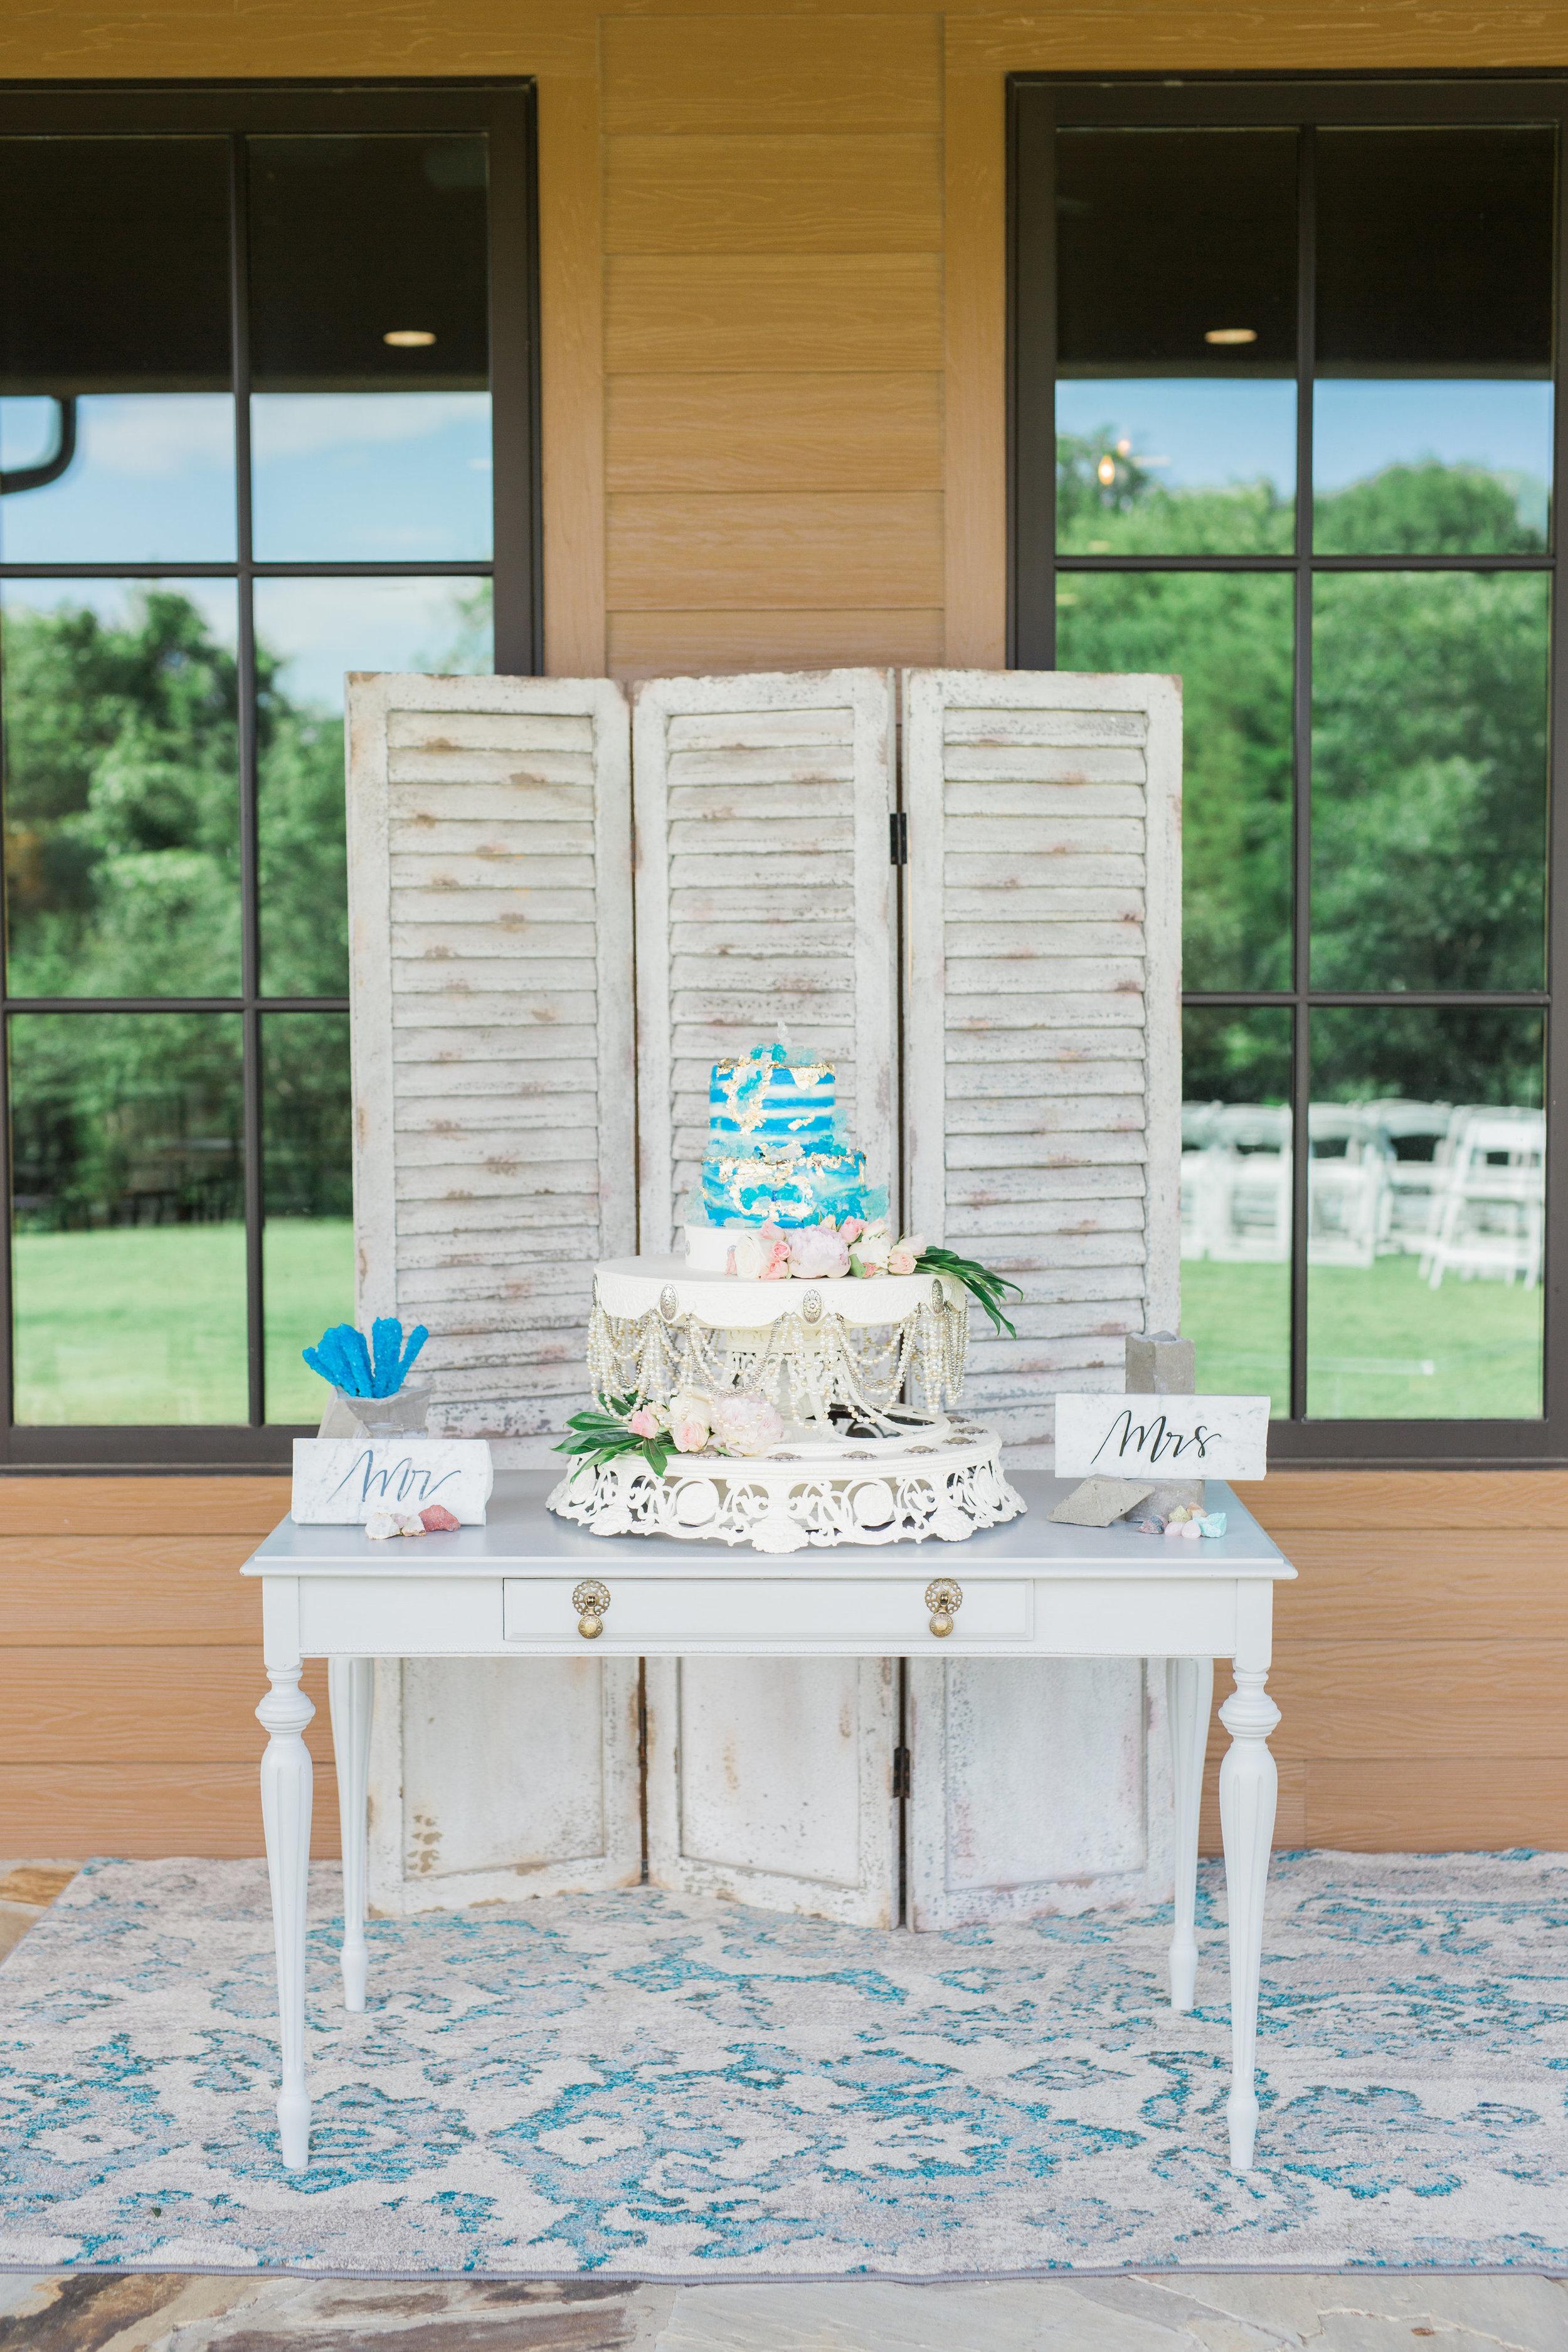 Bar + Cake + Entry-0145.jpg